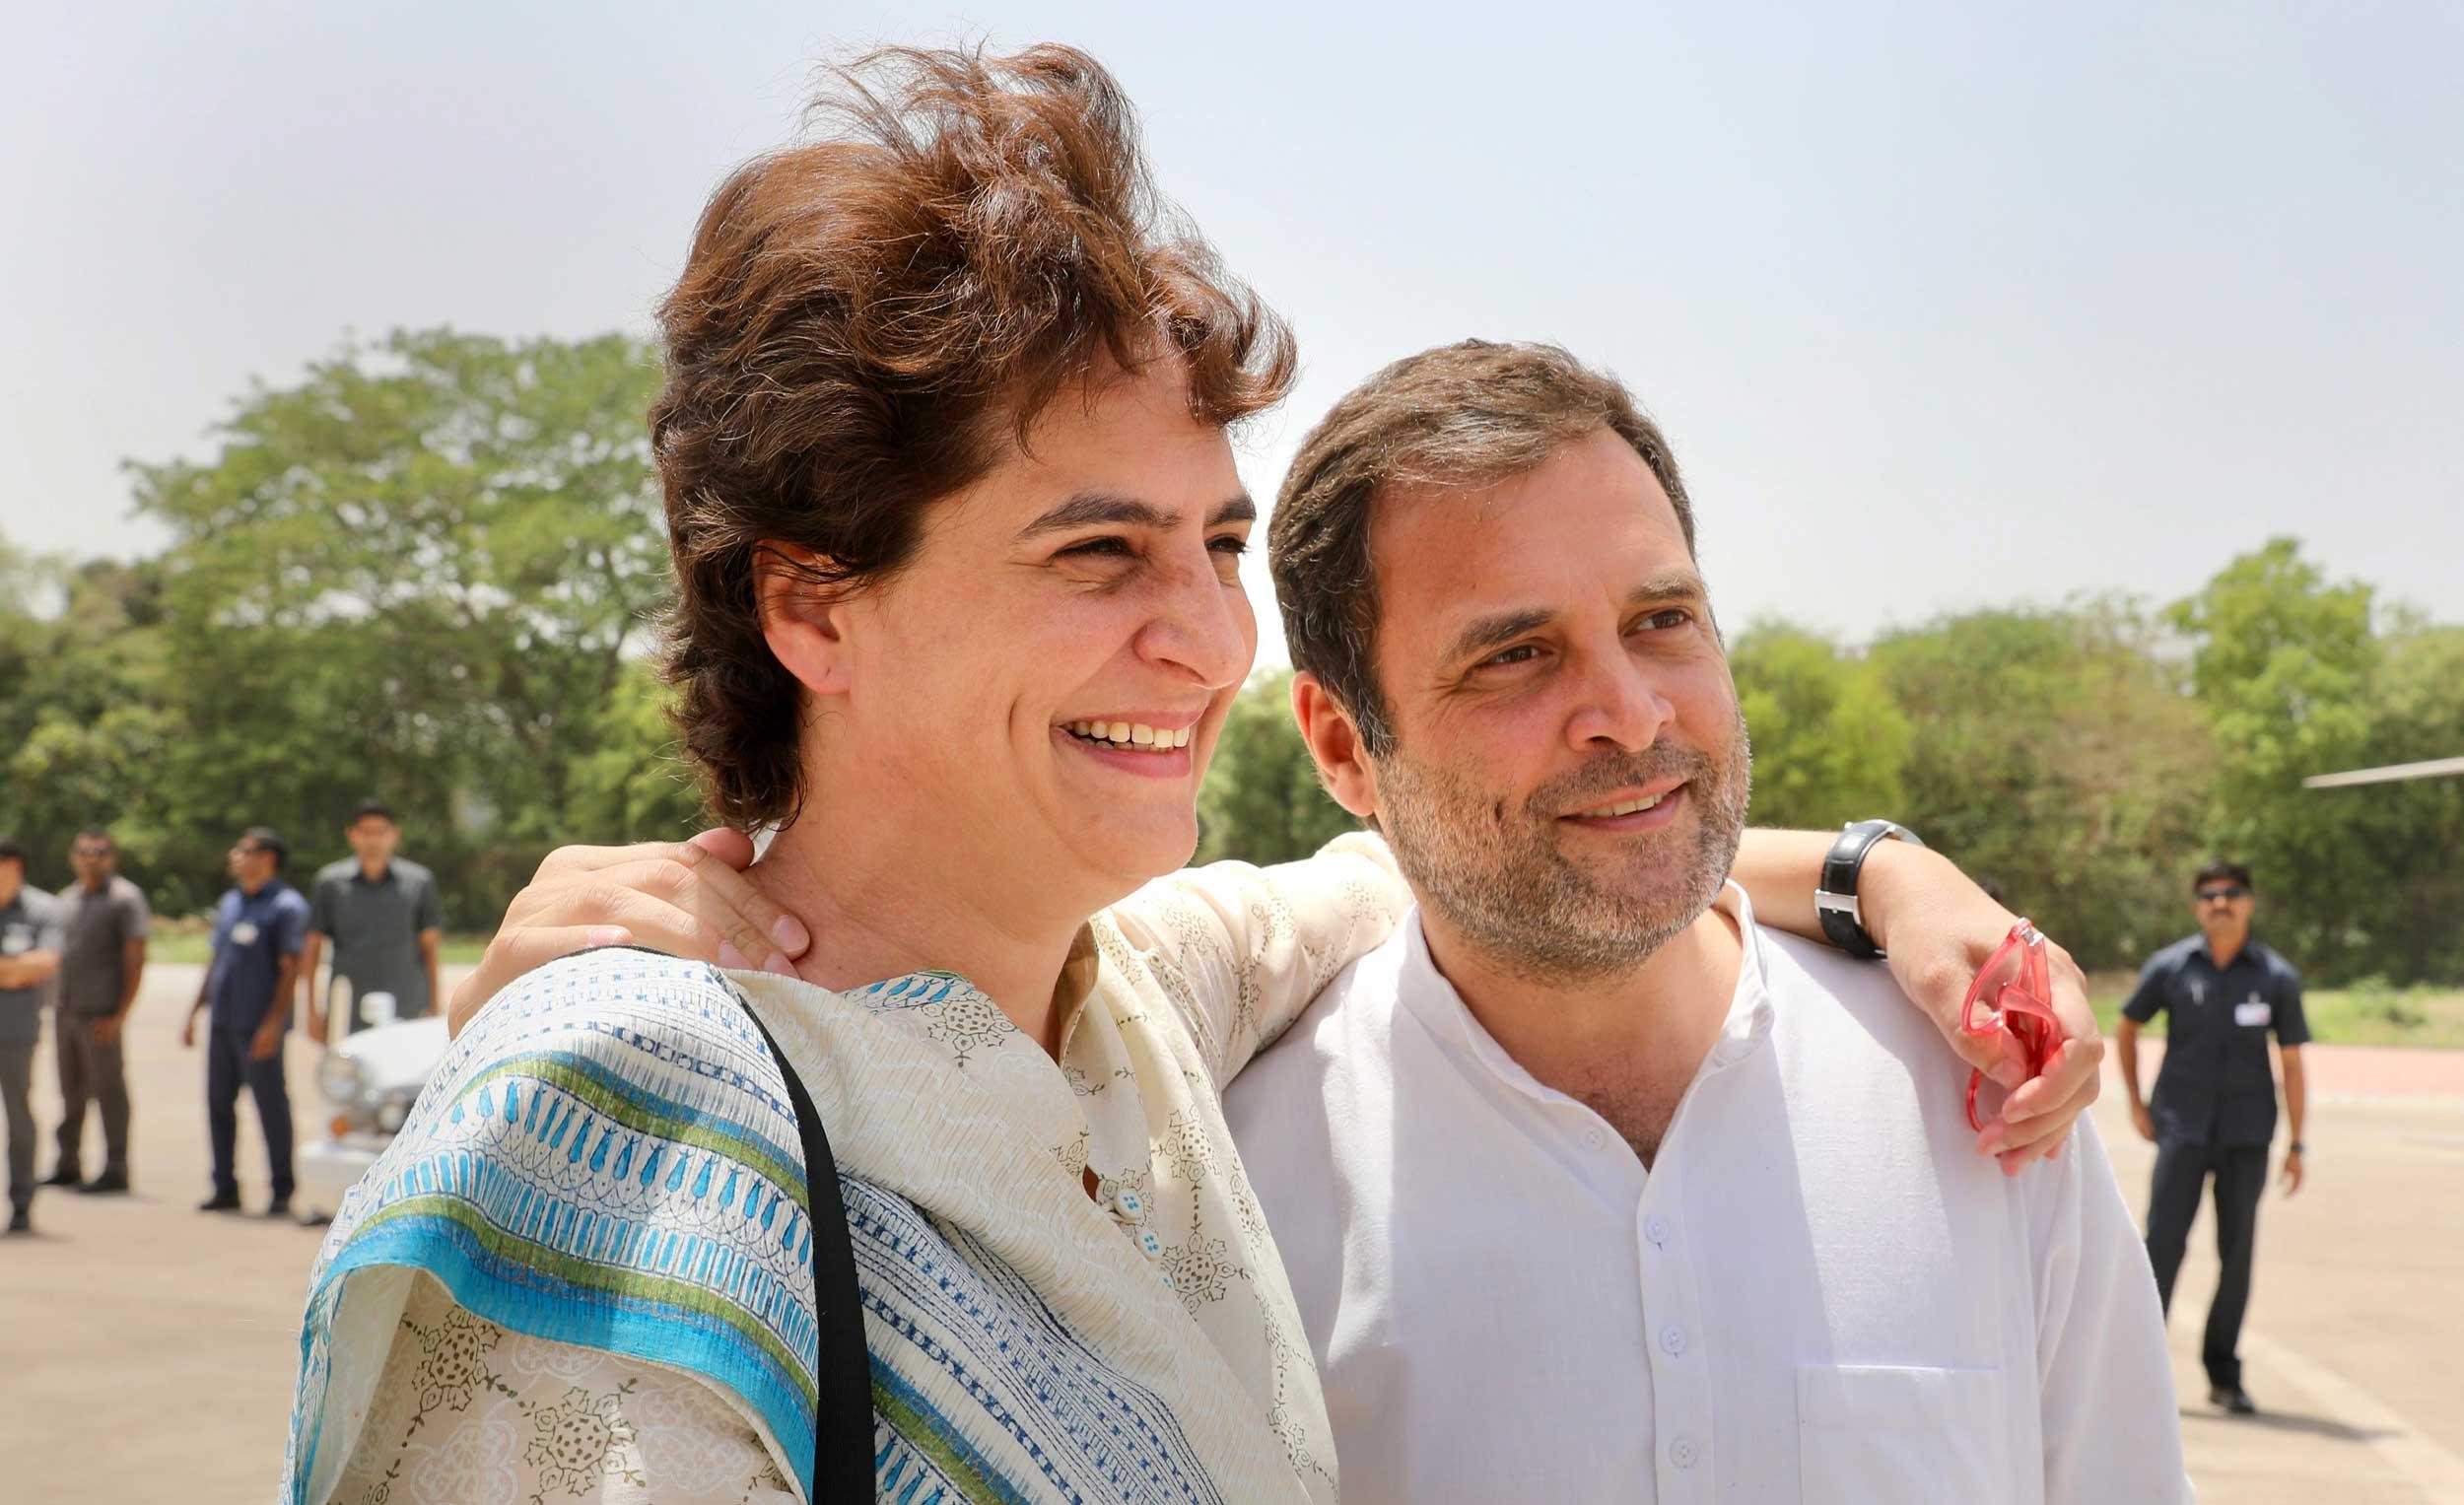 Congress leader Priyanka Gandhi Vadra said